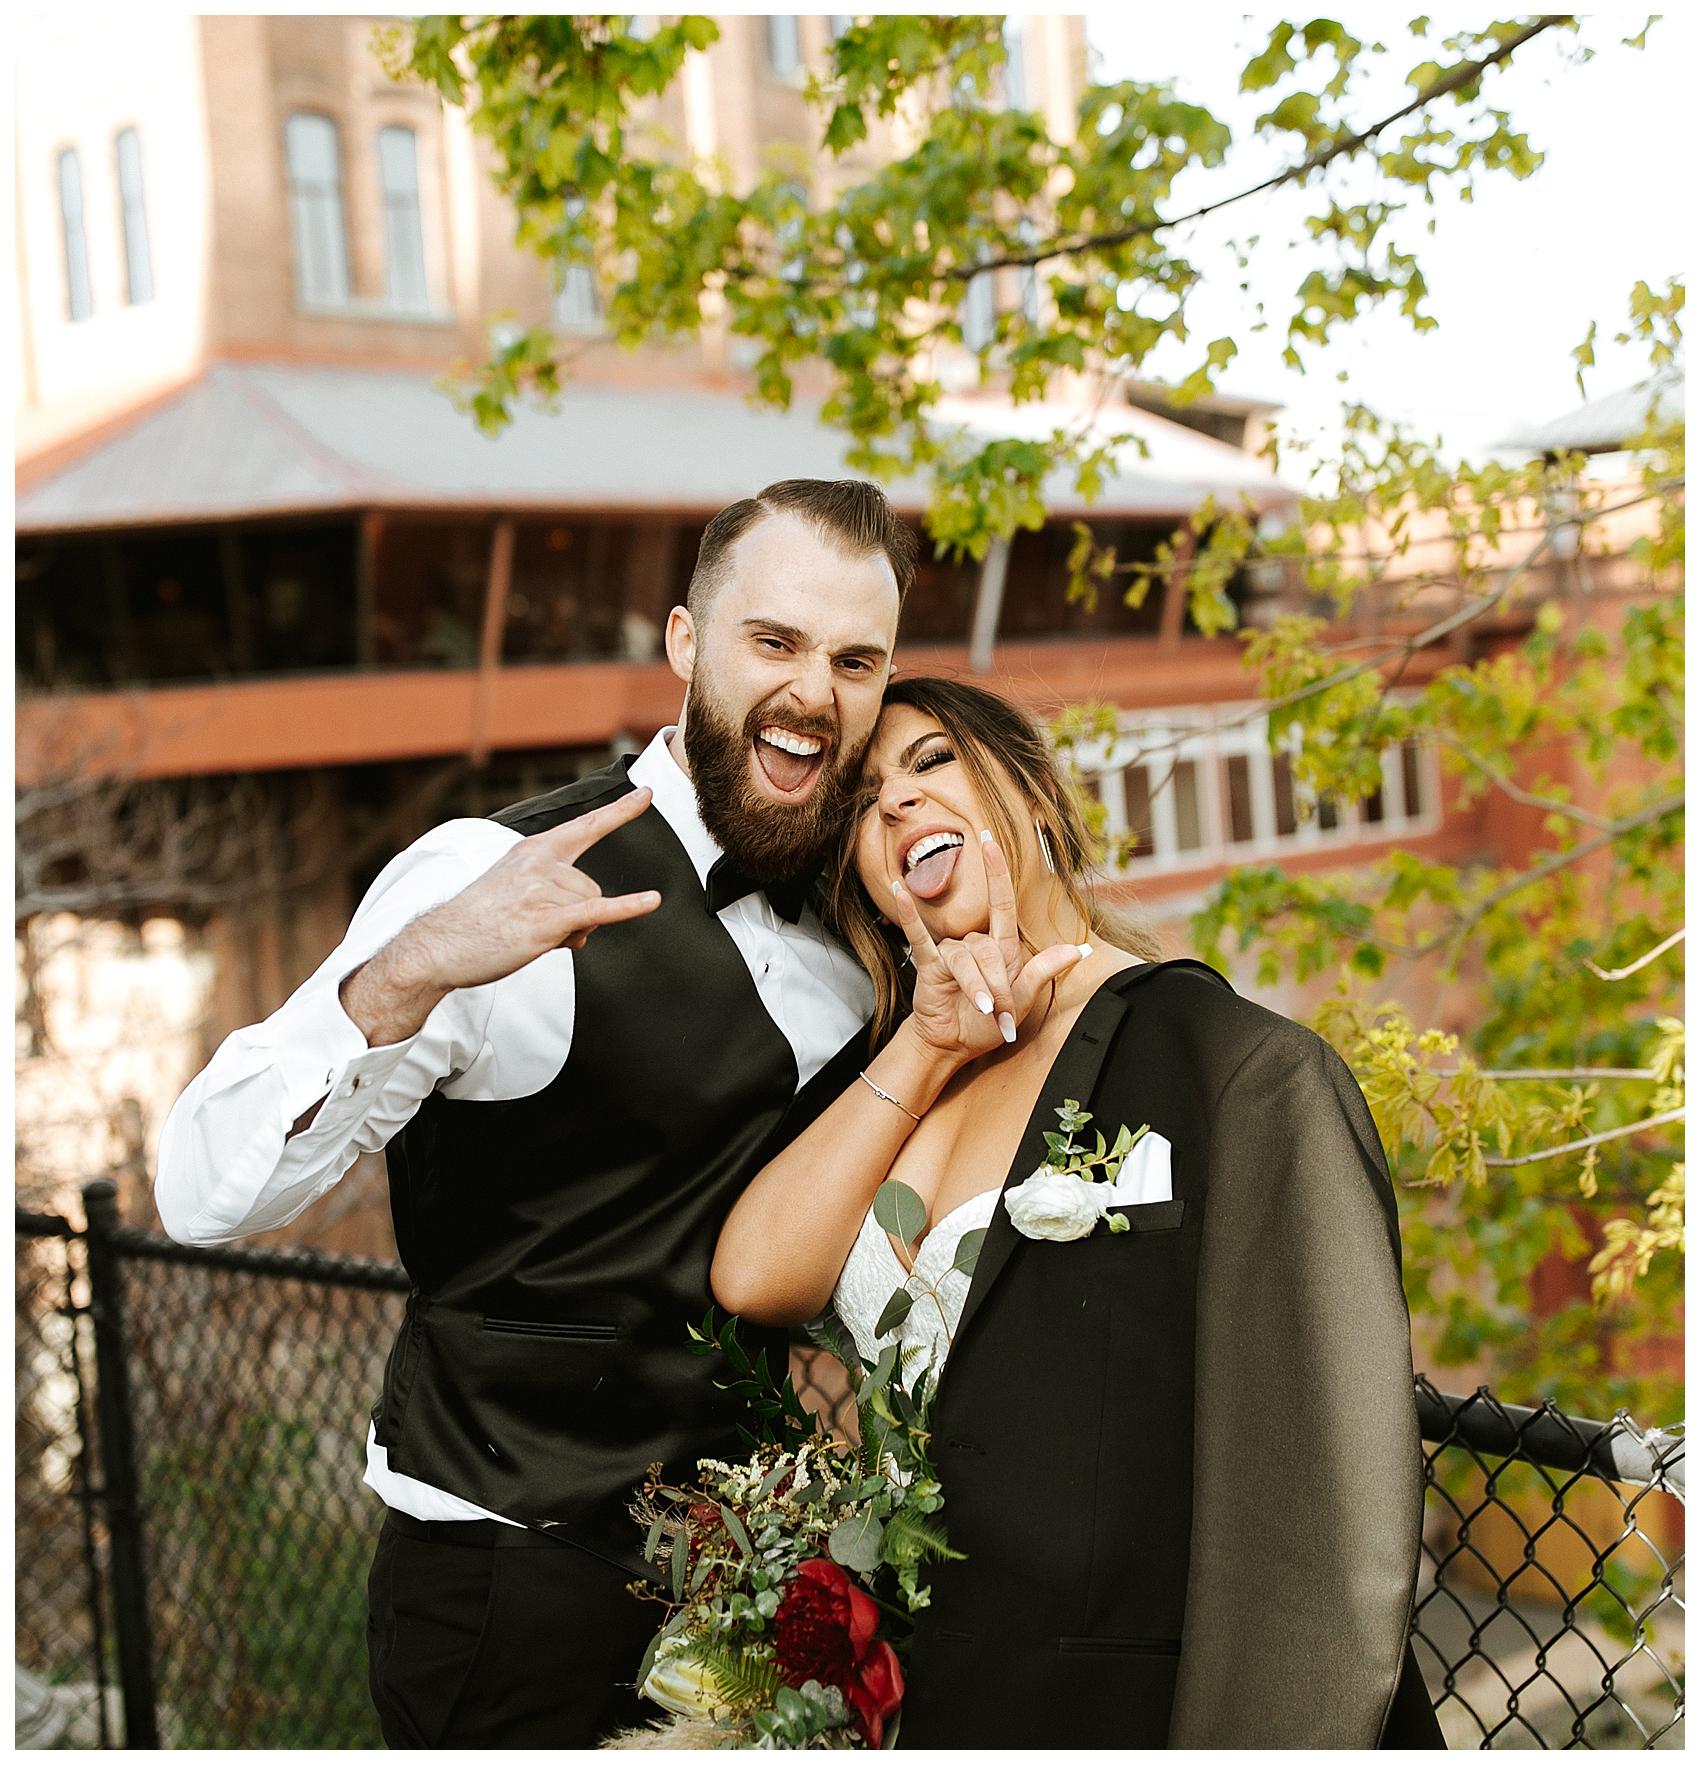 Chateau Rive Spokane Wedding Cassie Trottier Photography01089.jpg